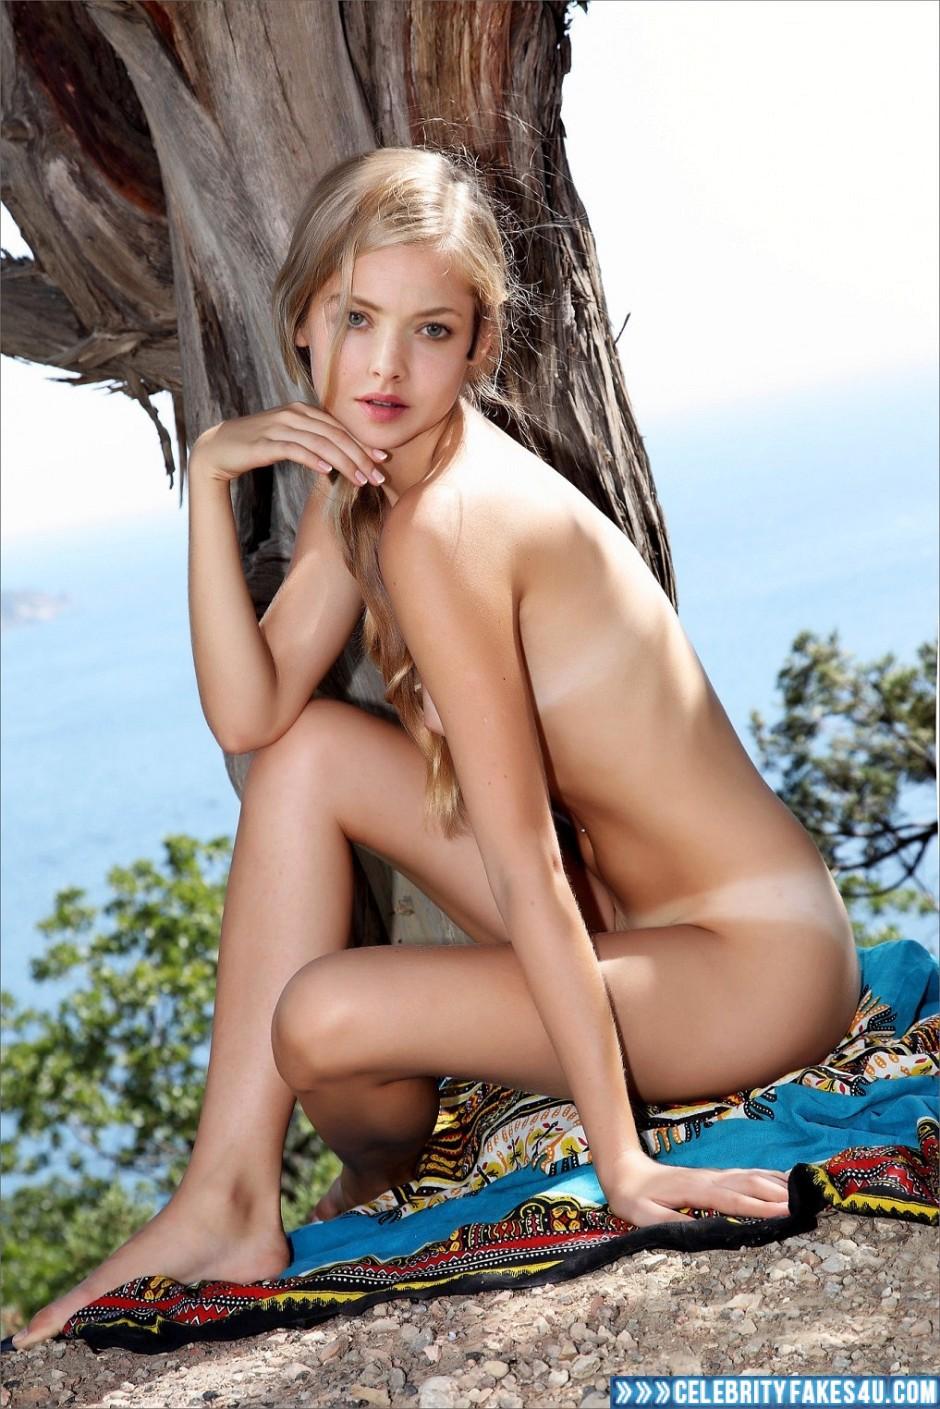 amanda seyfried fakes nude